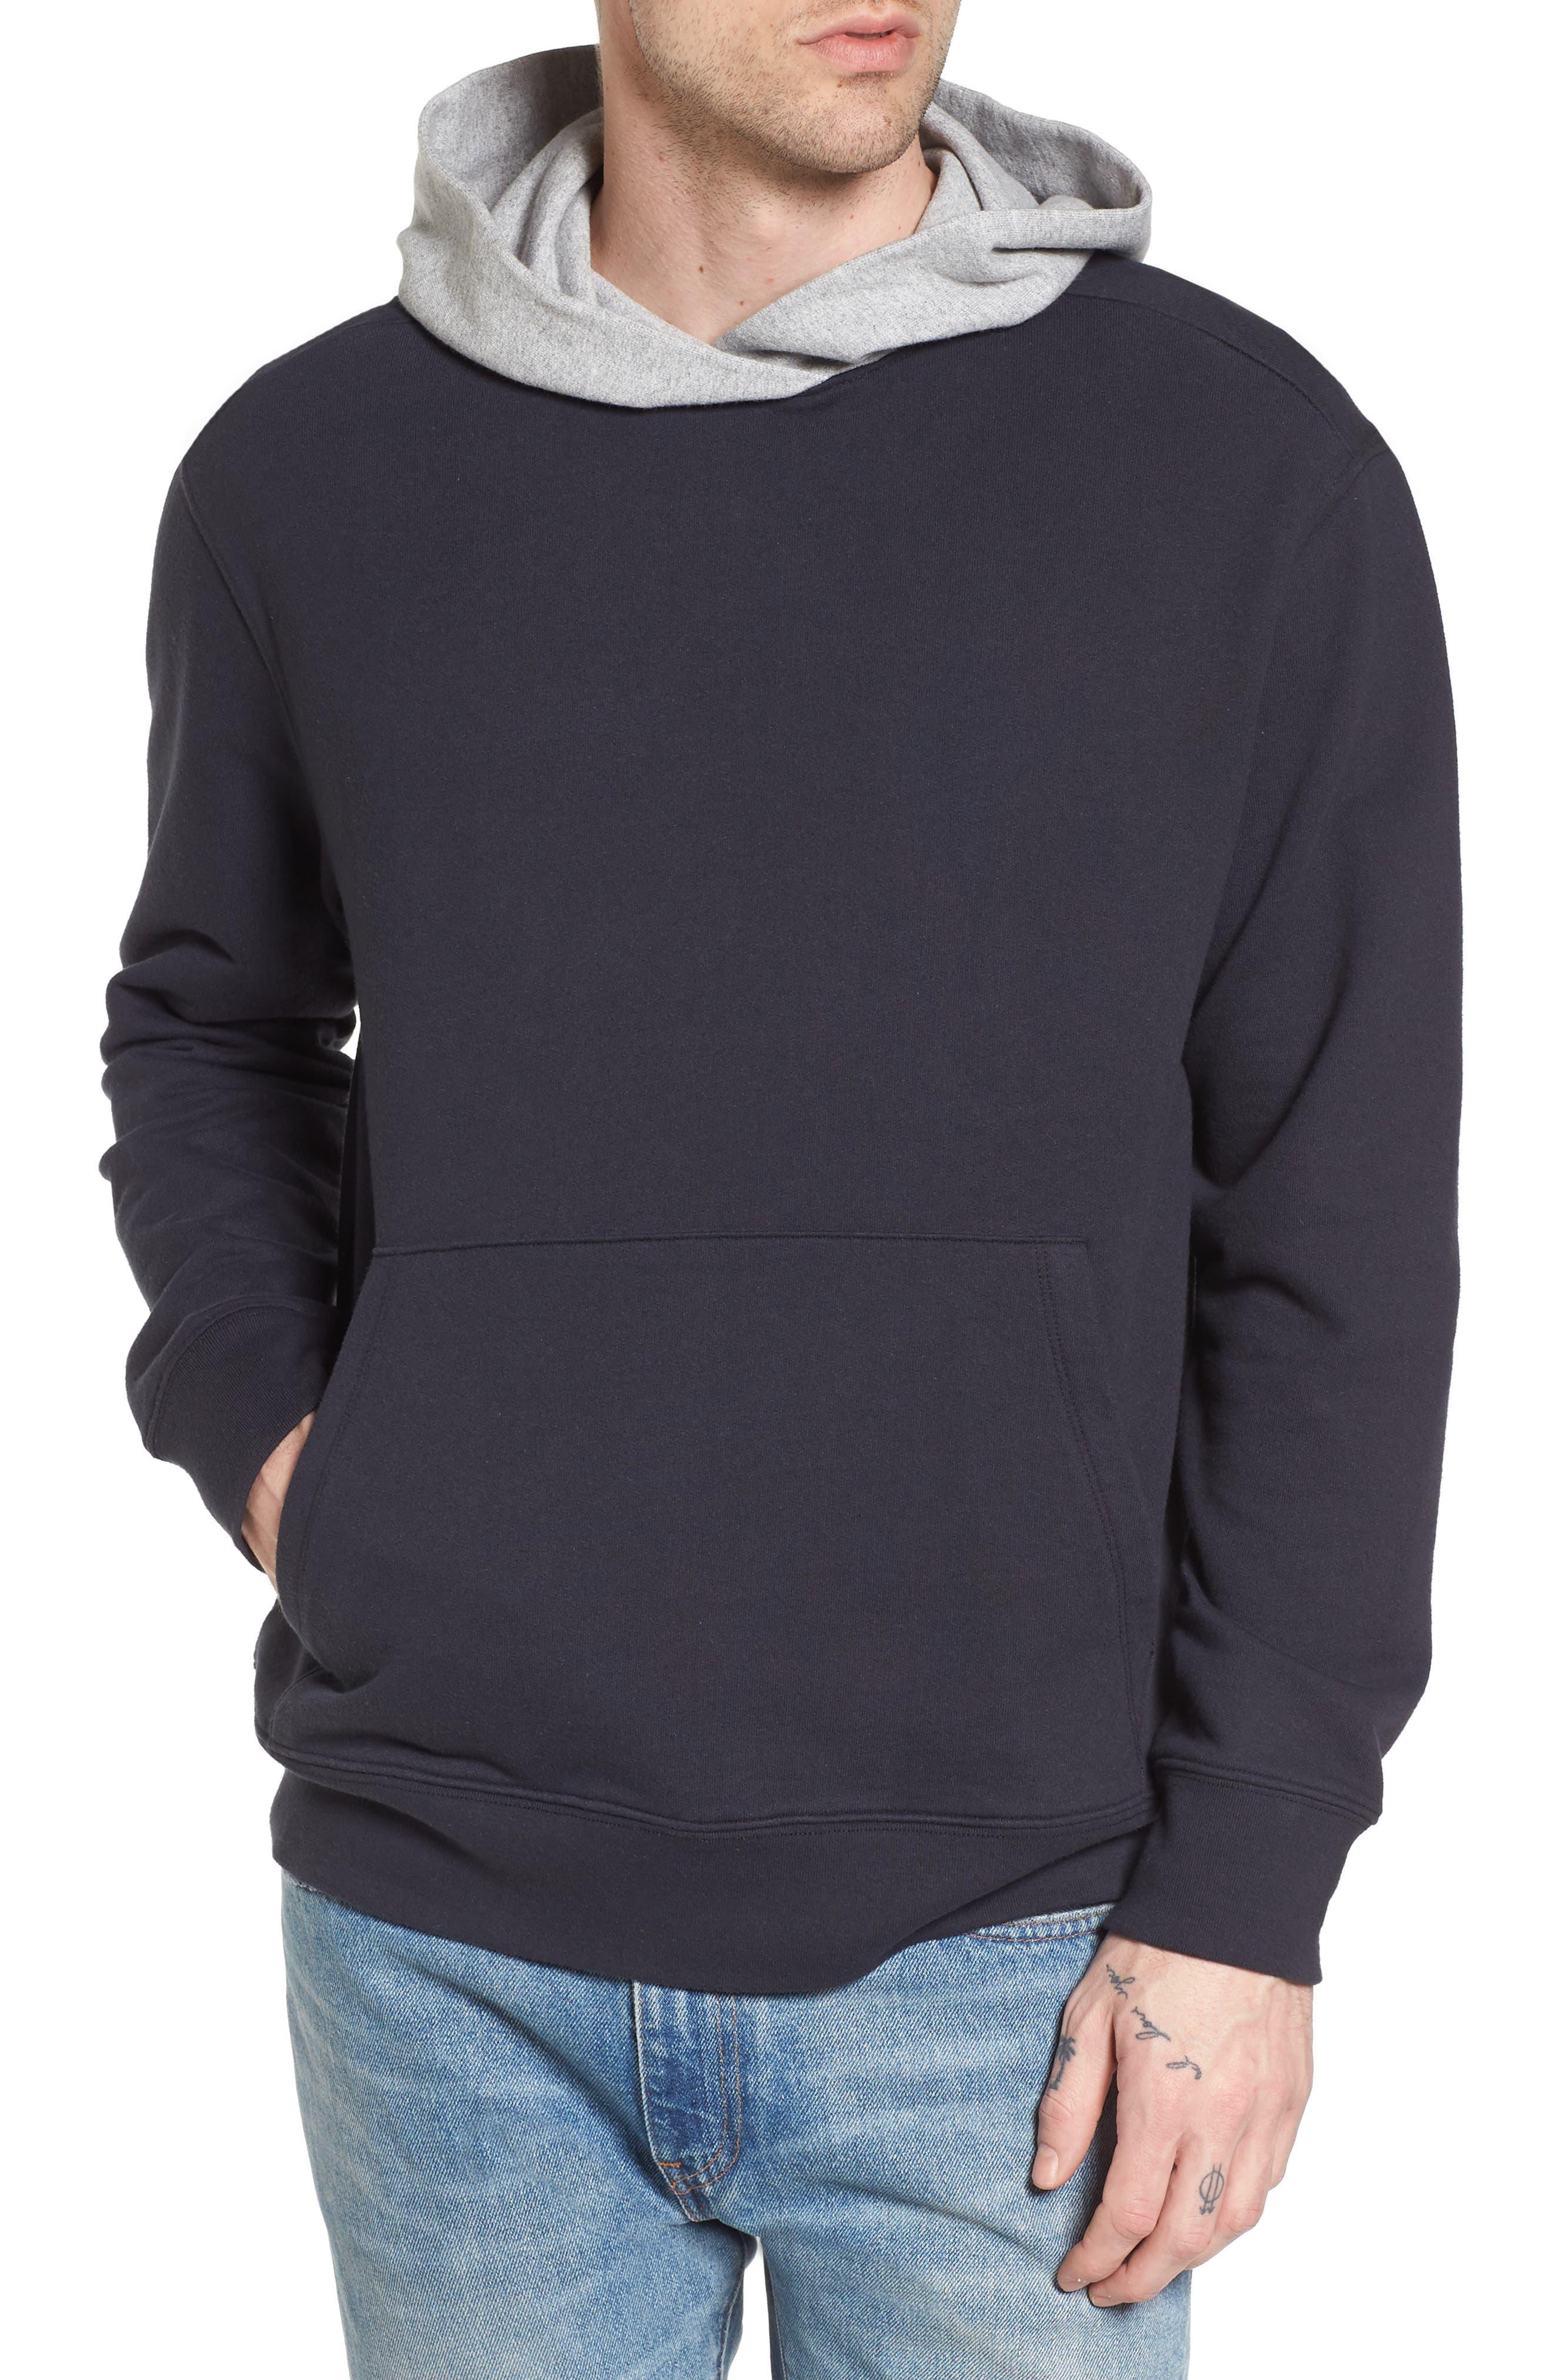 Colorblock Hoodie Sweatshirt,                         Main,                         color, Black Rock/ Grey Heather